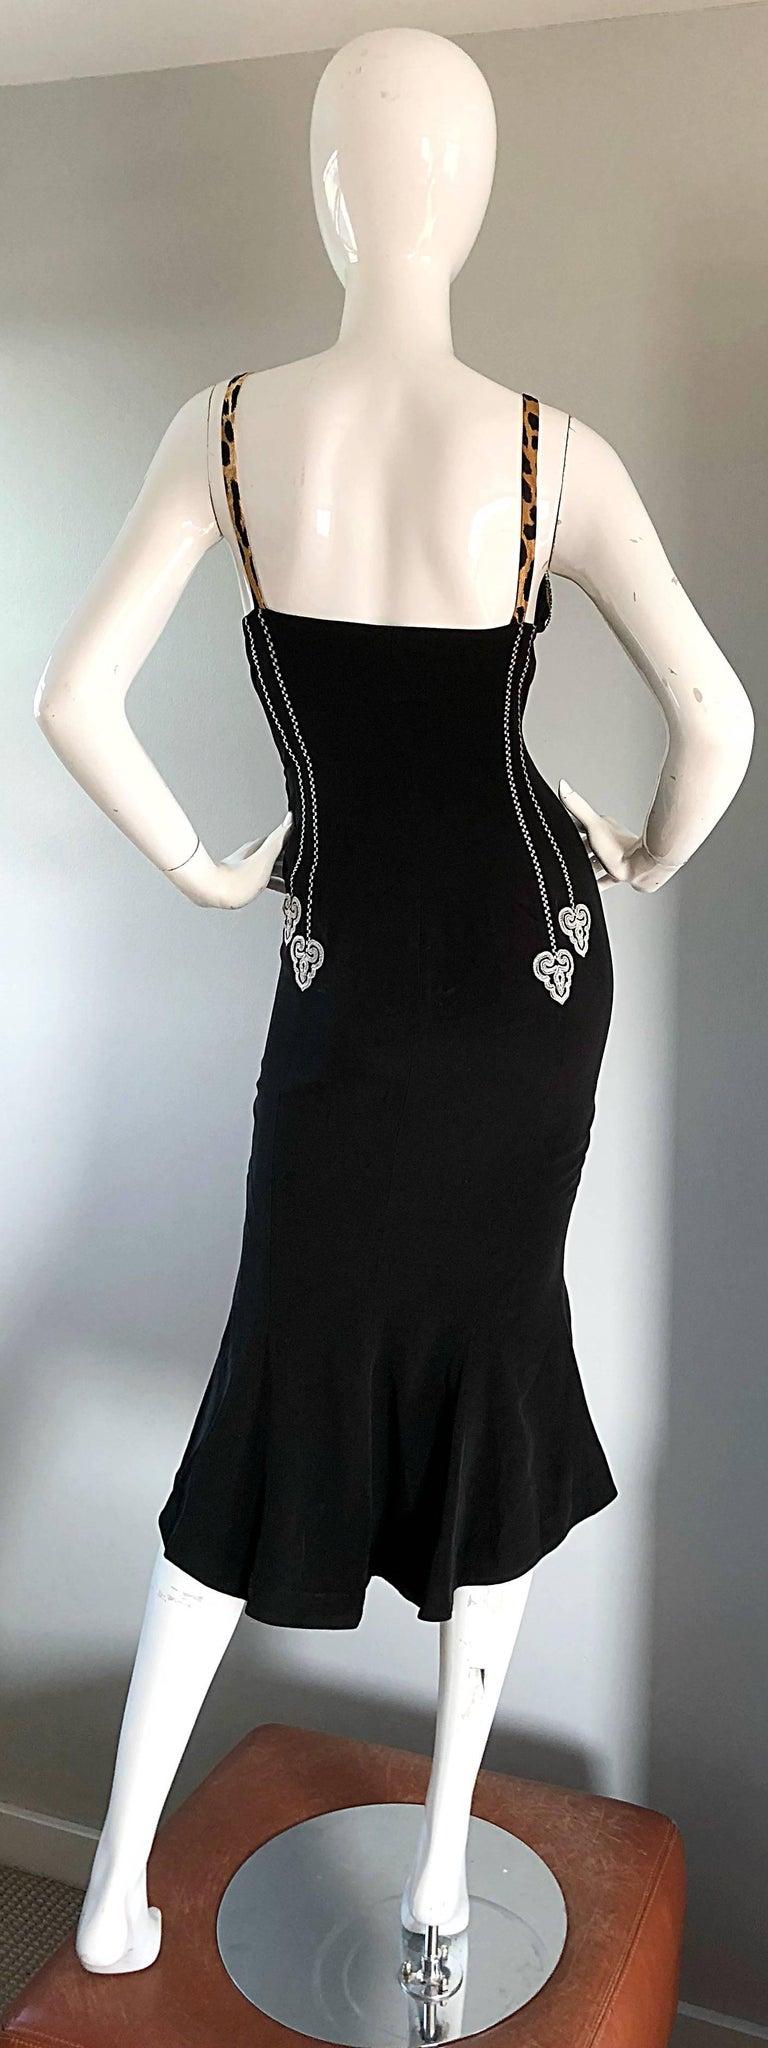 1980s Rifat Ozbek Sz 8 Black White Leopard Print Coin Embellished Mermaid Dress For Sale 5